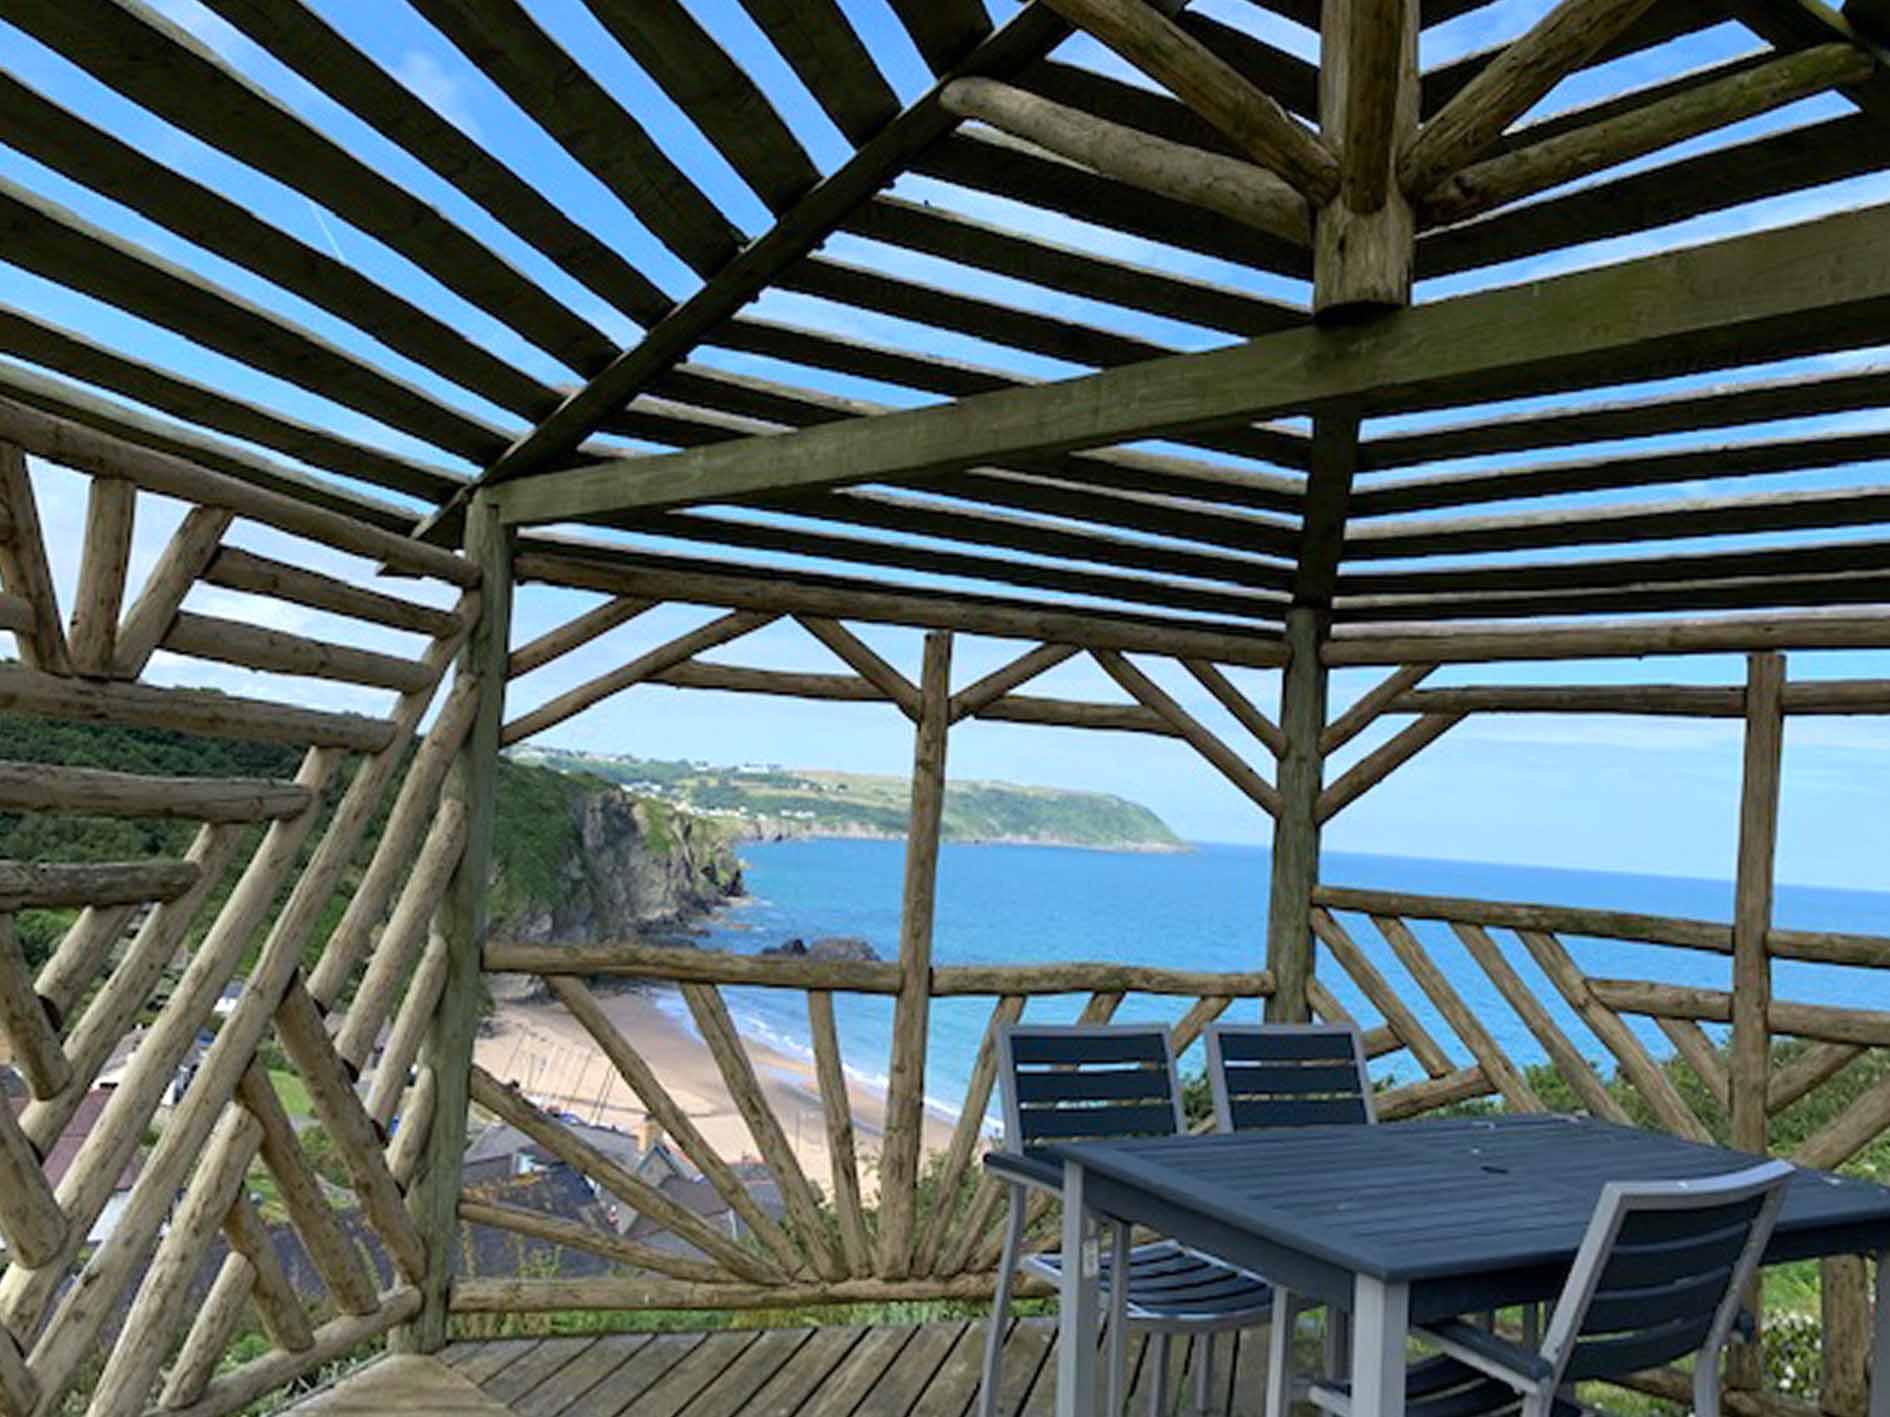 wales holiday accommodation, cardigan bay holiday park, gazeebo